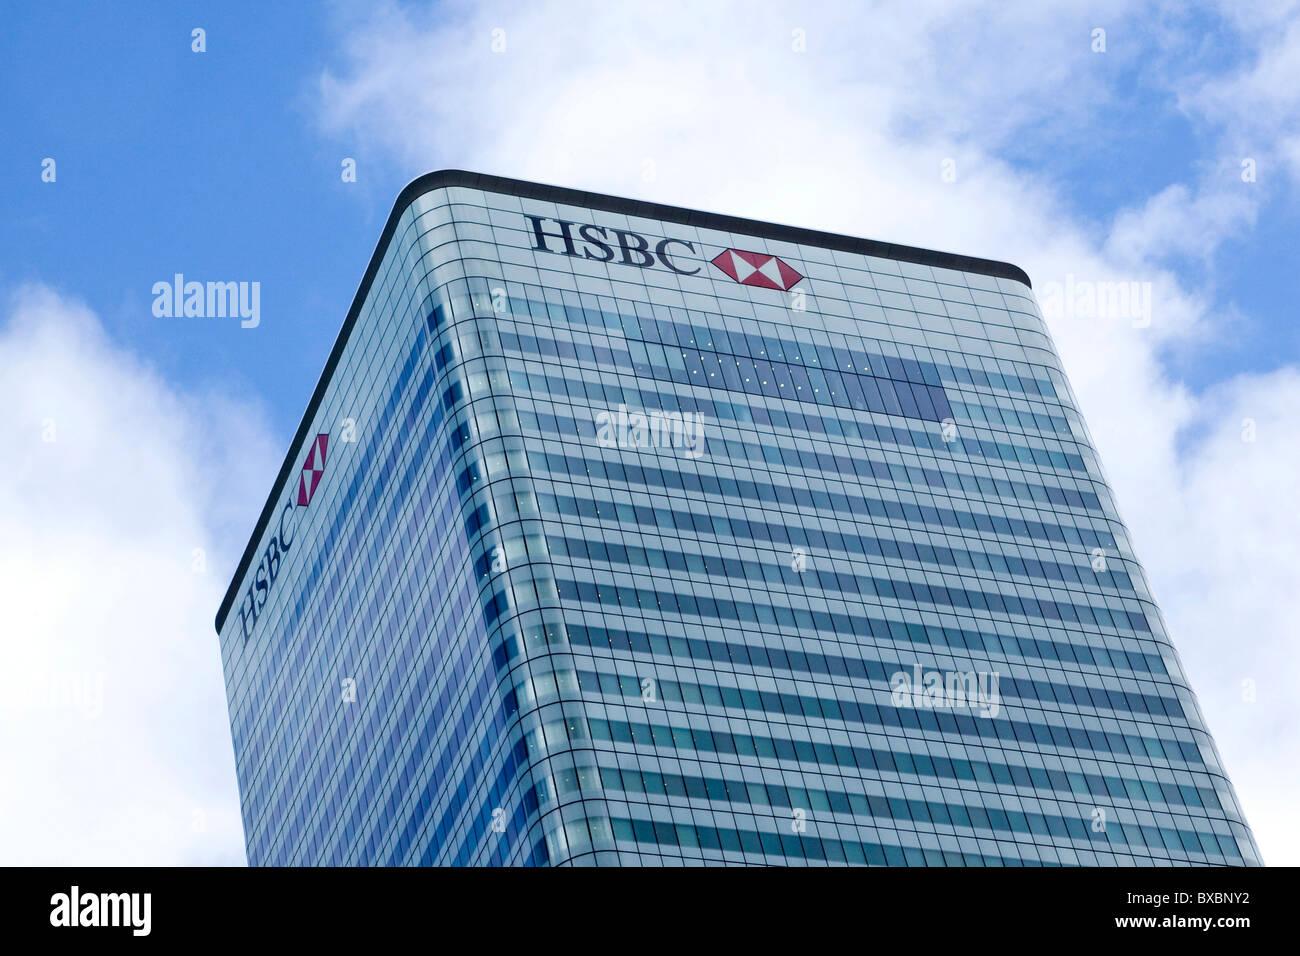 Hsbc London Headquarters Stock Photos & Hsbc London